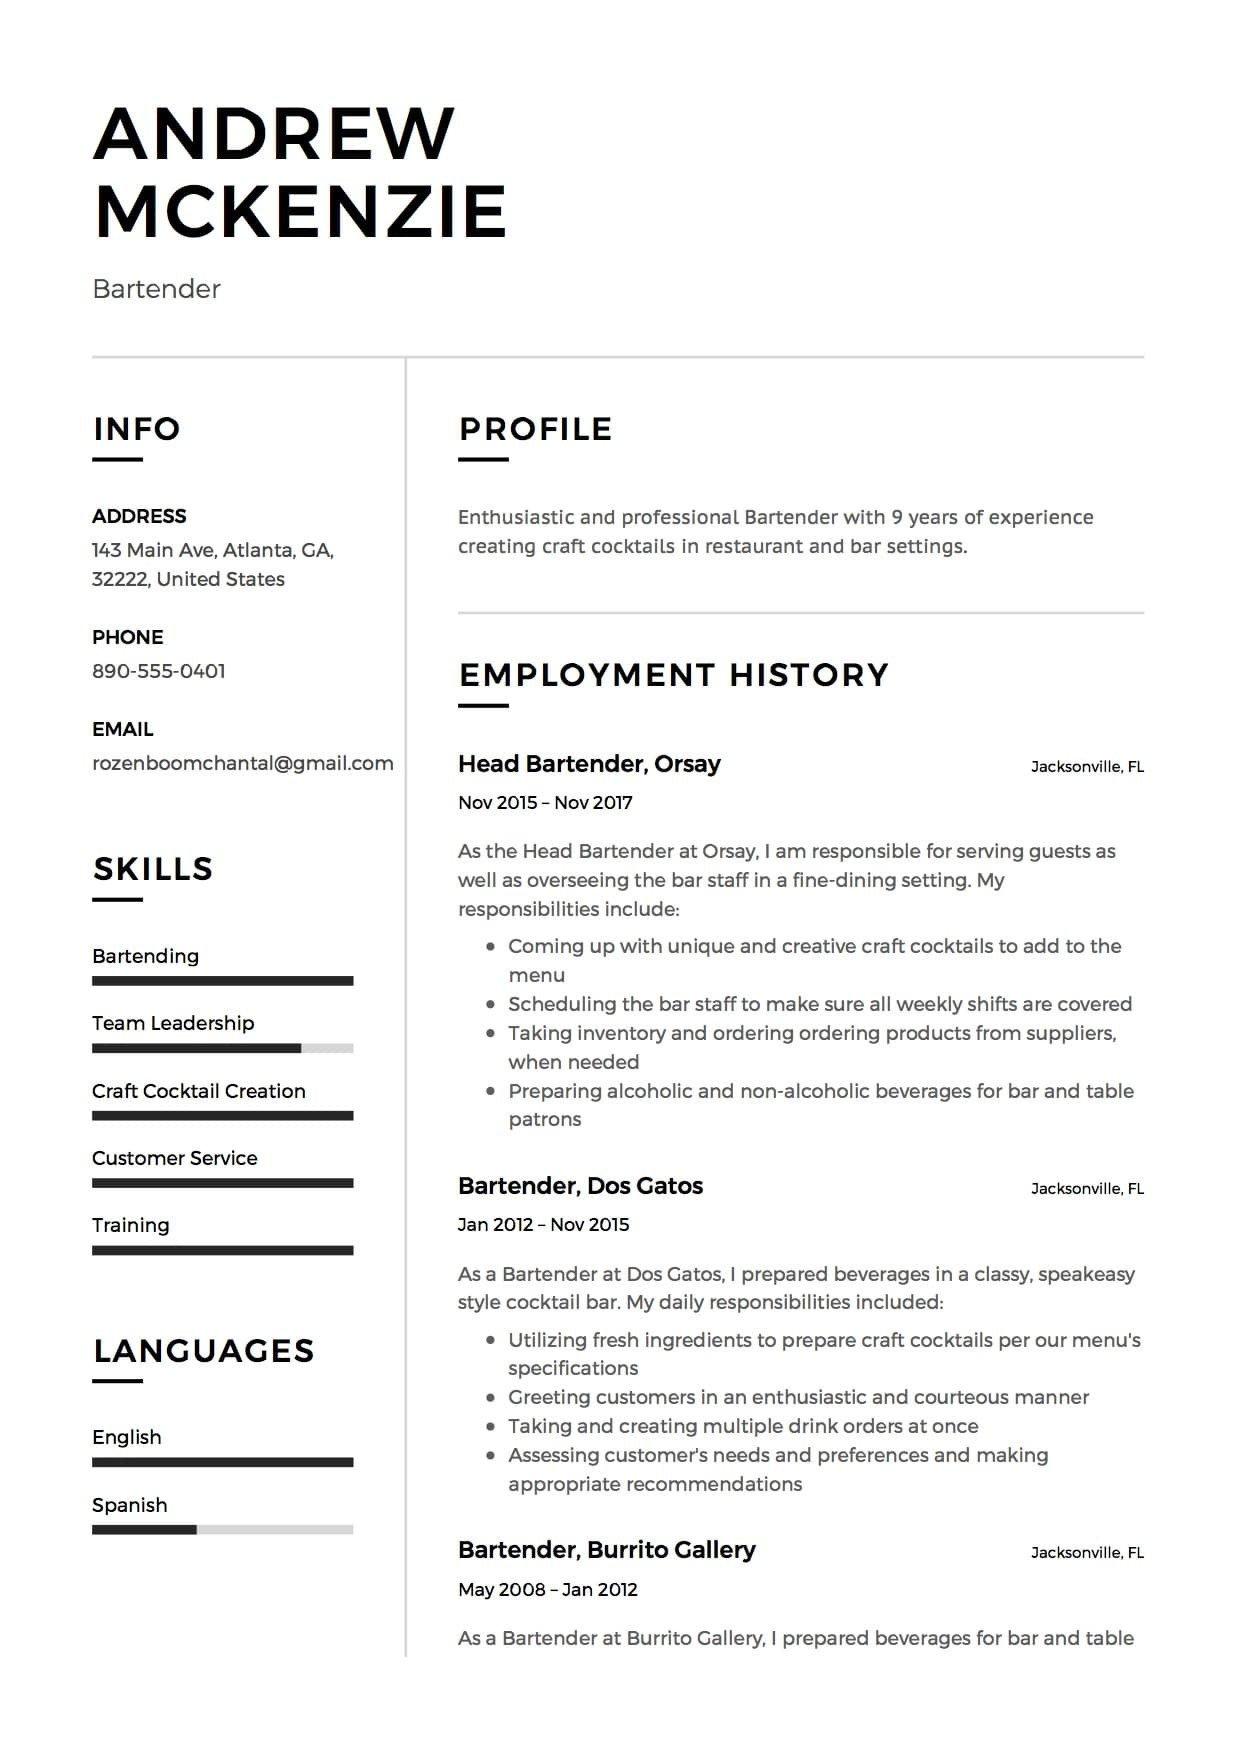 Free Bartender Resume Templates Bartender Resume Sample 12 Creative Resume Examples